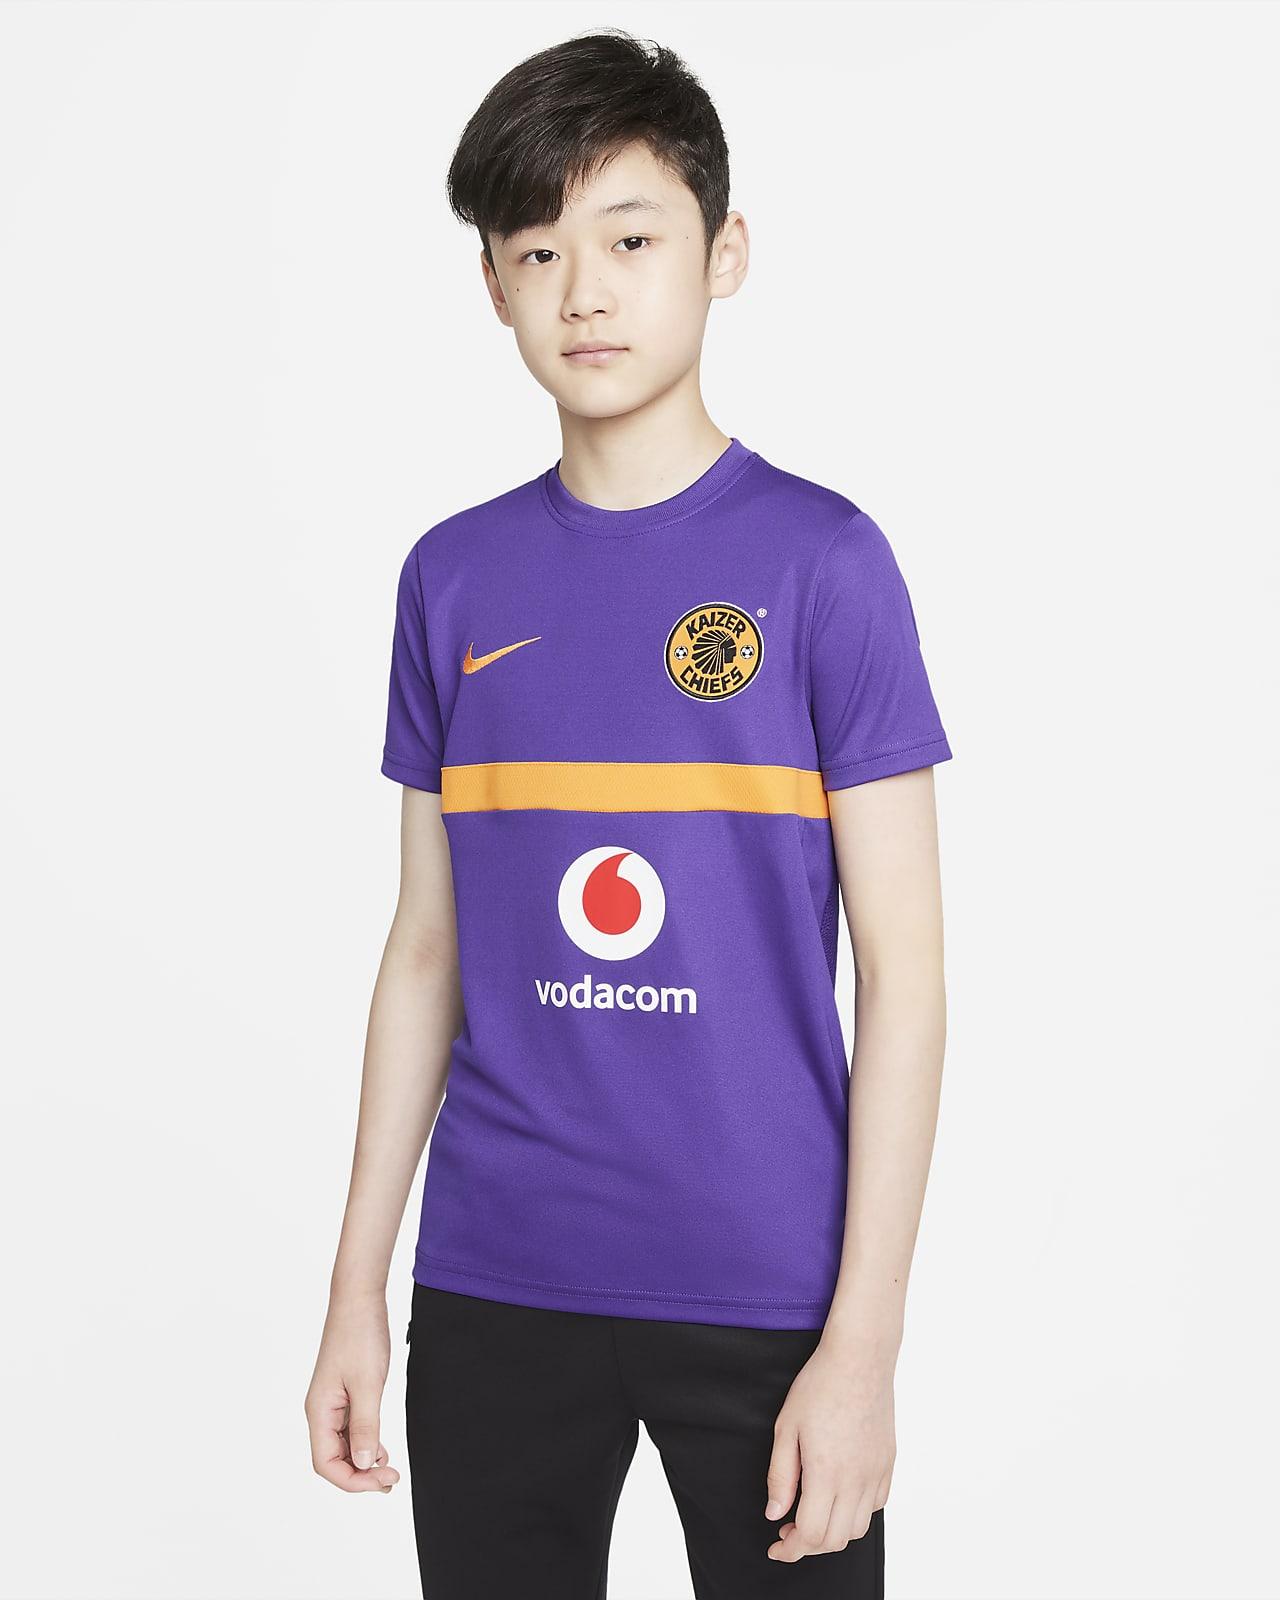 Kaizer Chiefs F.C. Academy Pro Older Kids' Nike Dri-FIT Football Top